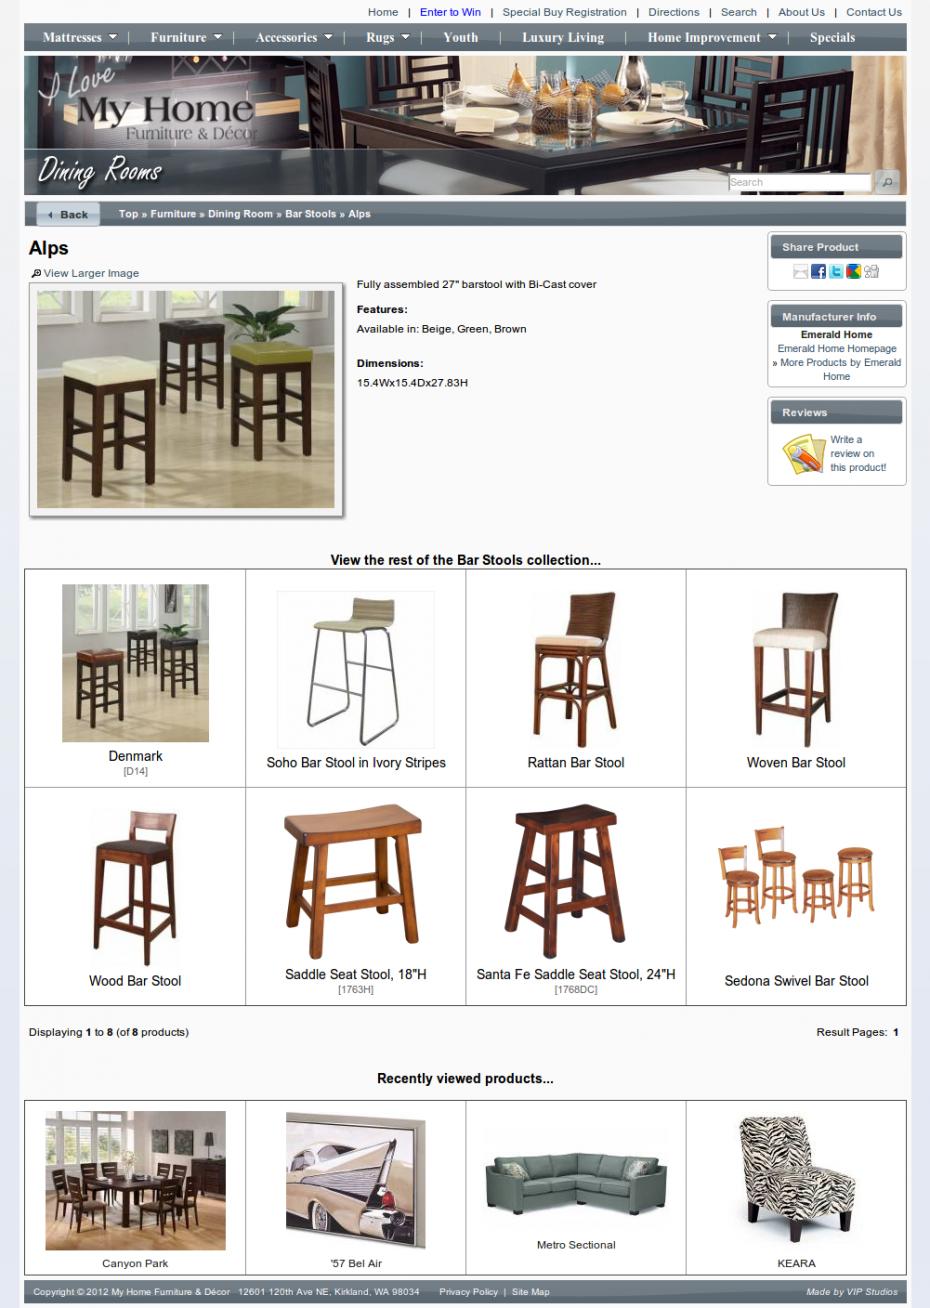 My Home Furniture   D cor   Casey Faber  Seattle Freelance Web Designer    Developer. My Home Furniture   D cor   Casey Faber  Seattle Freelance Web